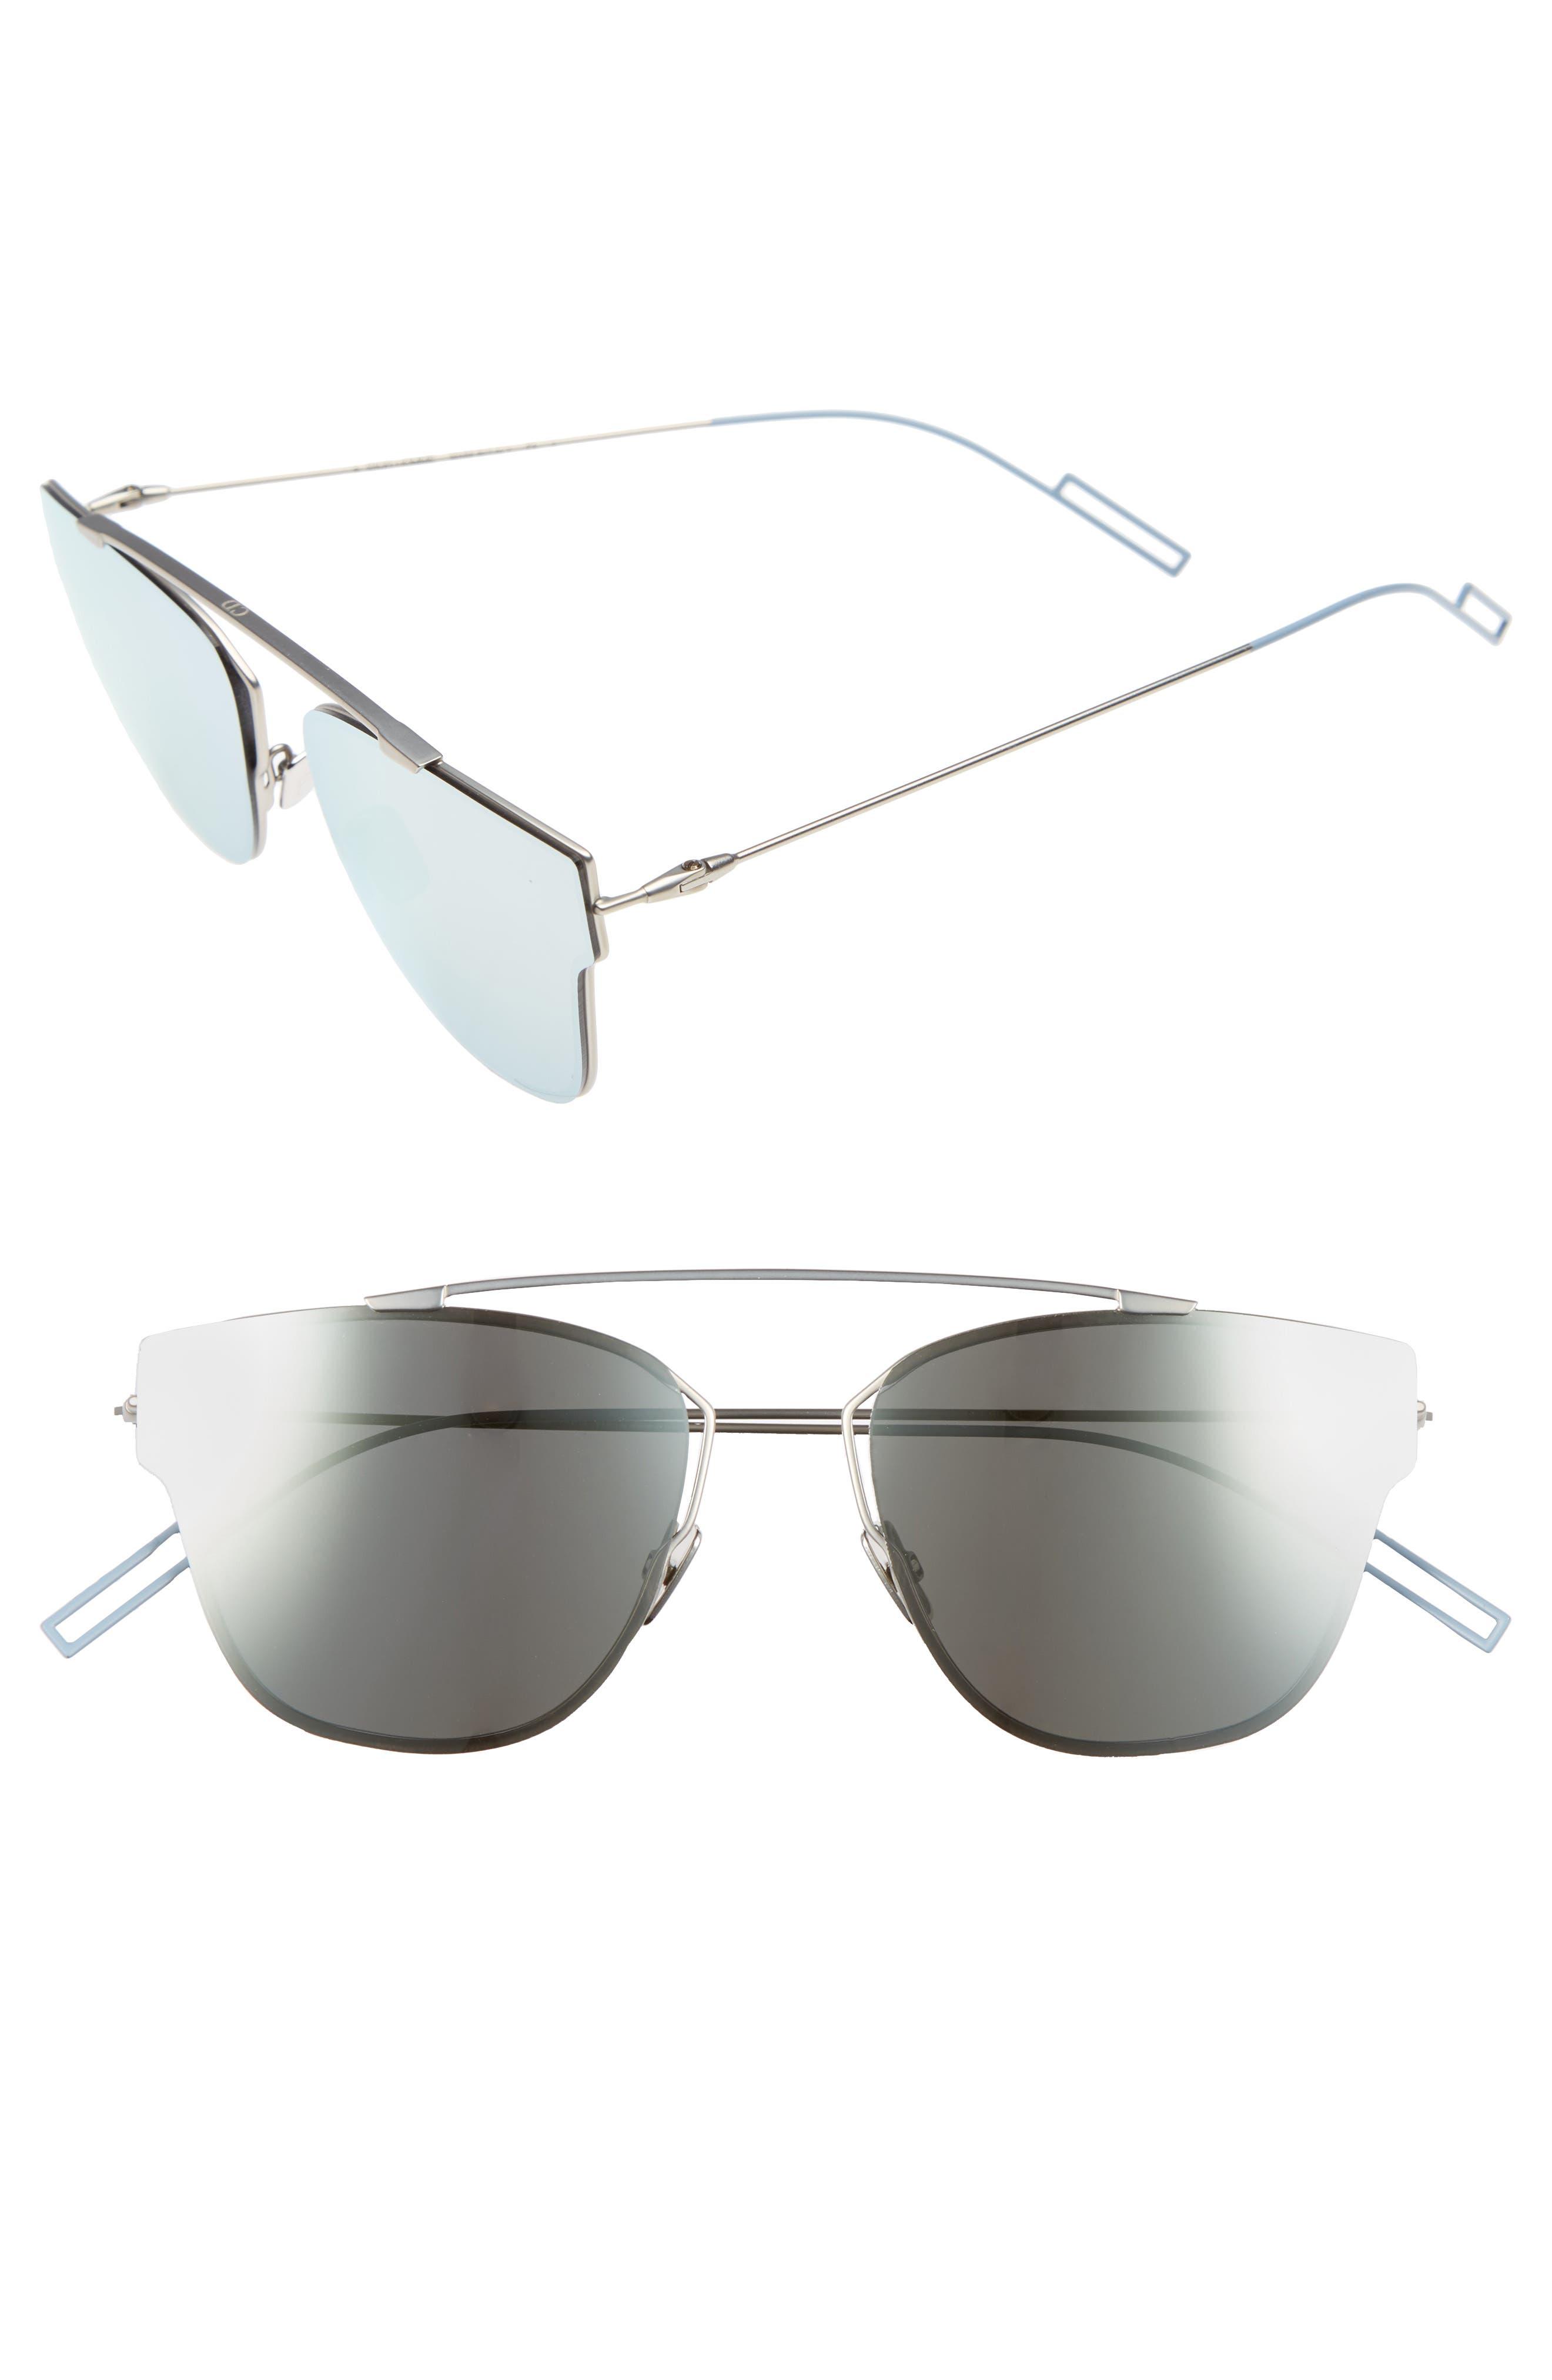 57mm Semi Rimless Sunglasses,                             Alternate thumbnail 2, color,                             020